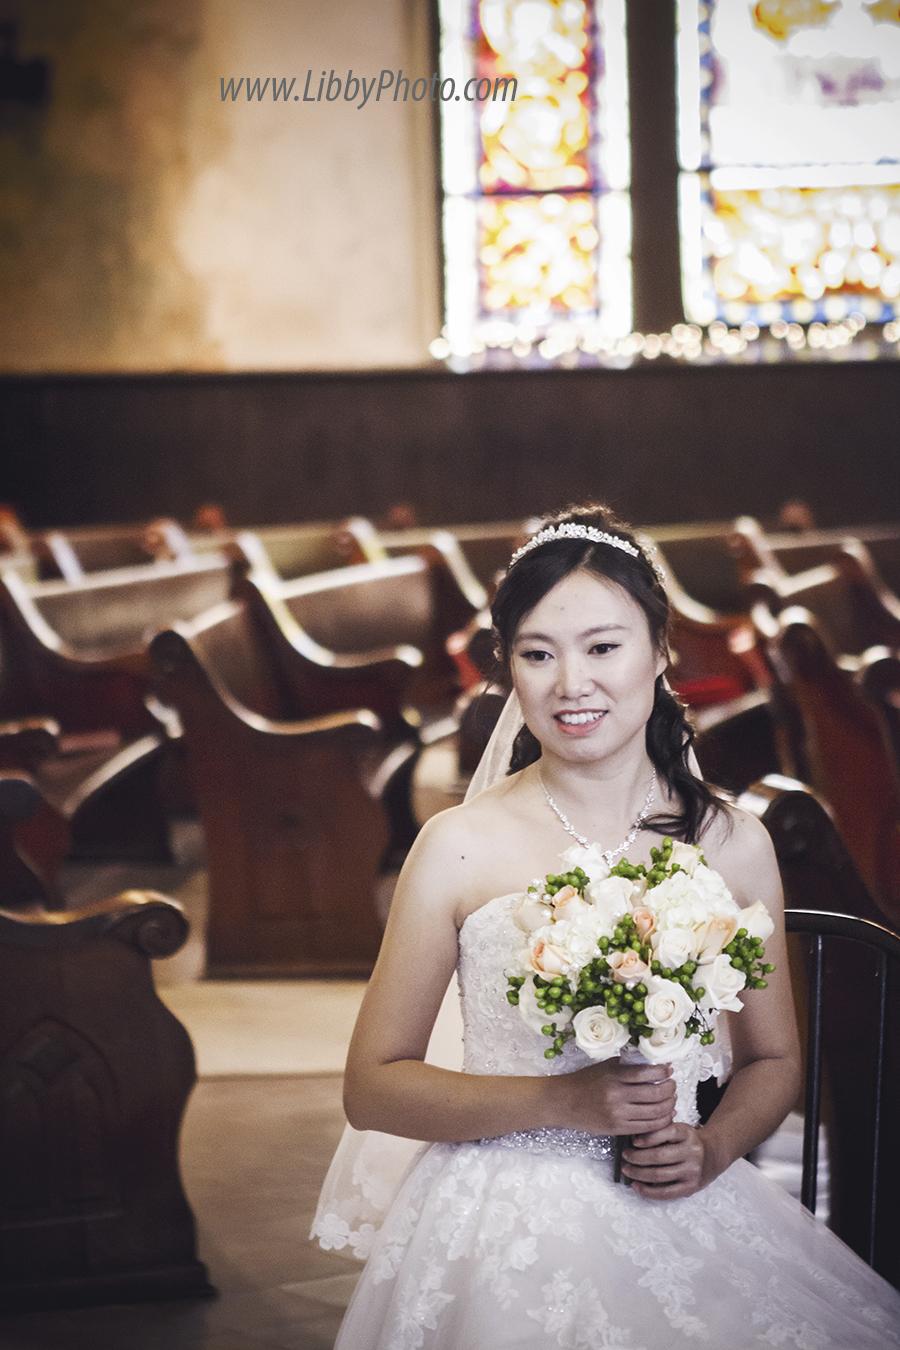 Atlanta wedding photography Libbyphoto (8).jpg